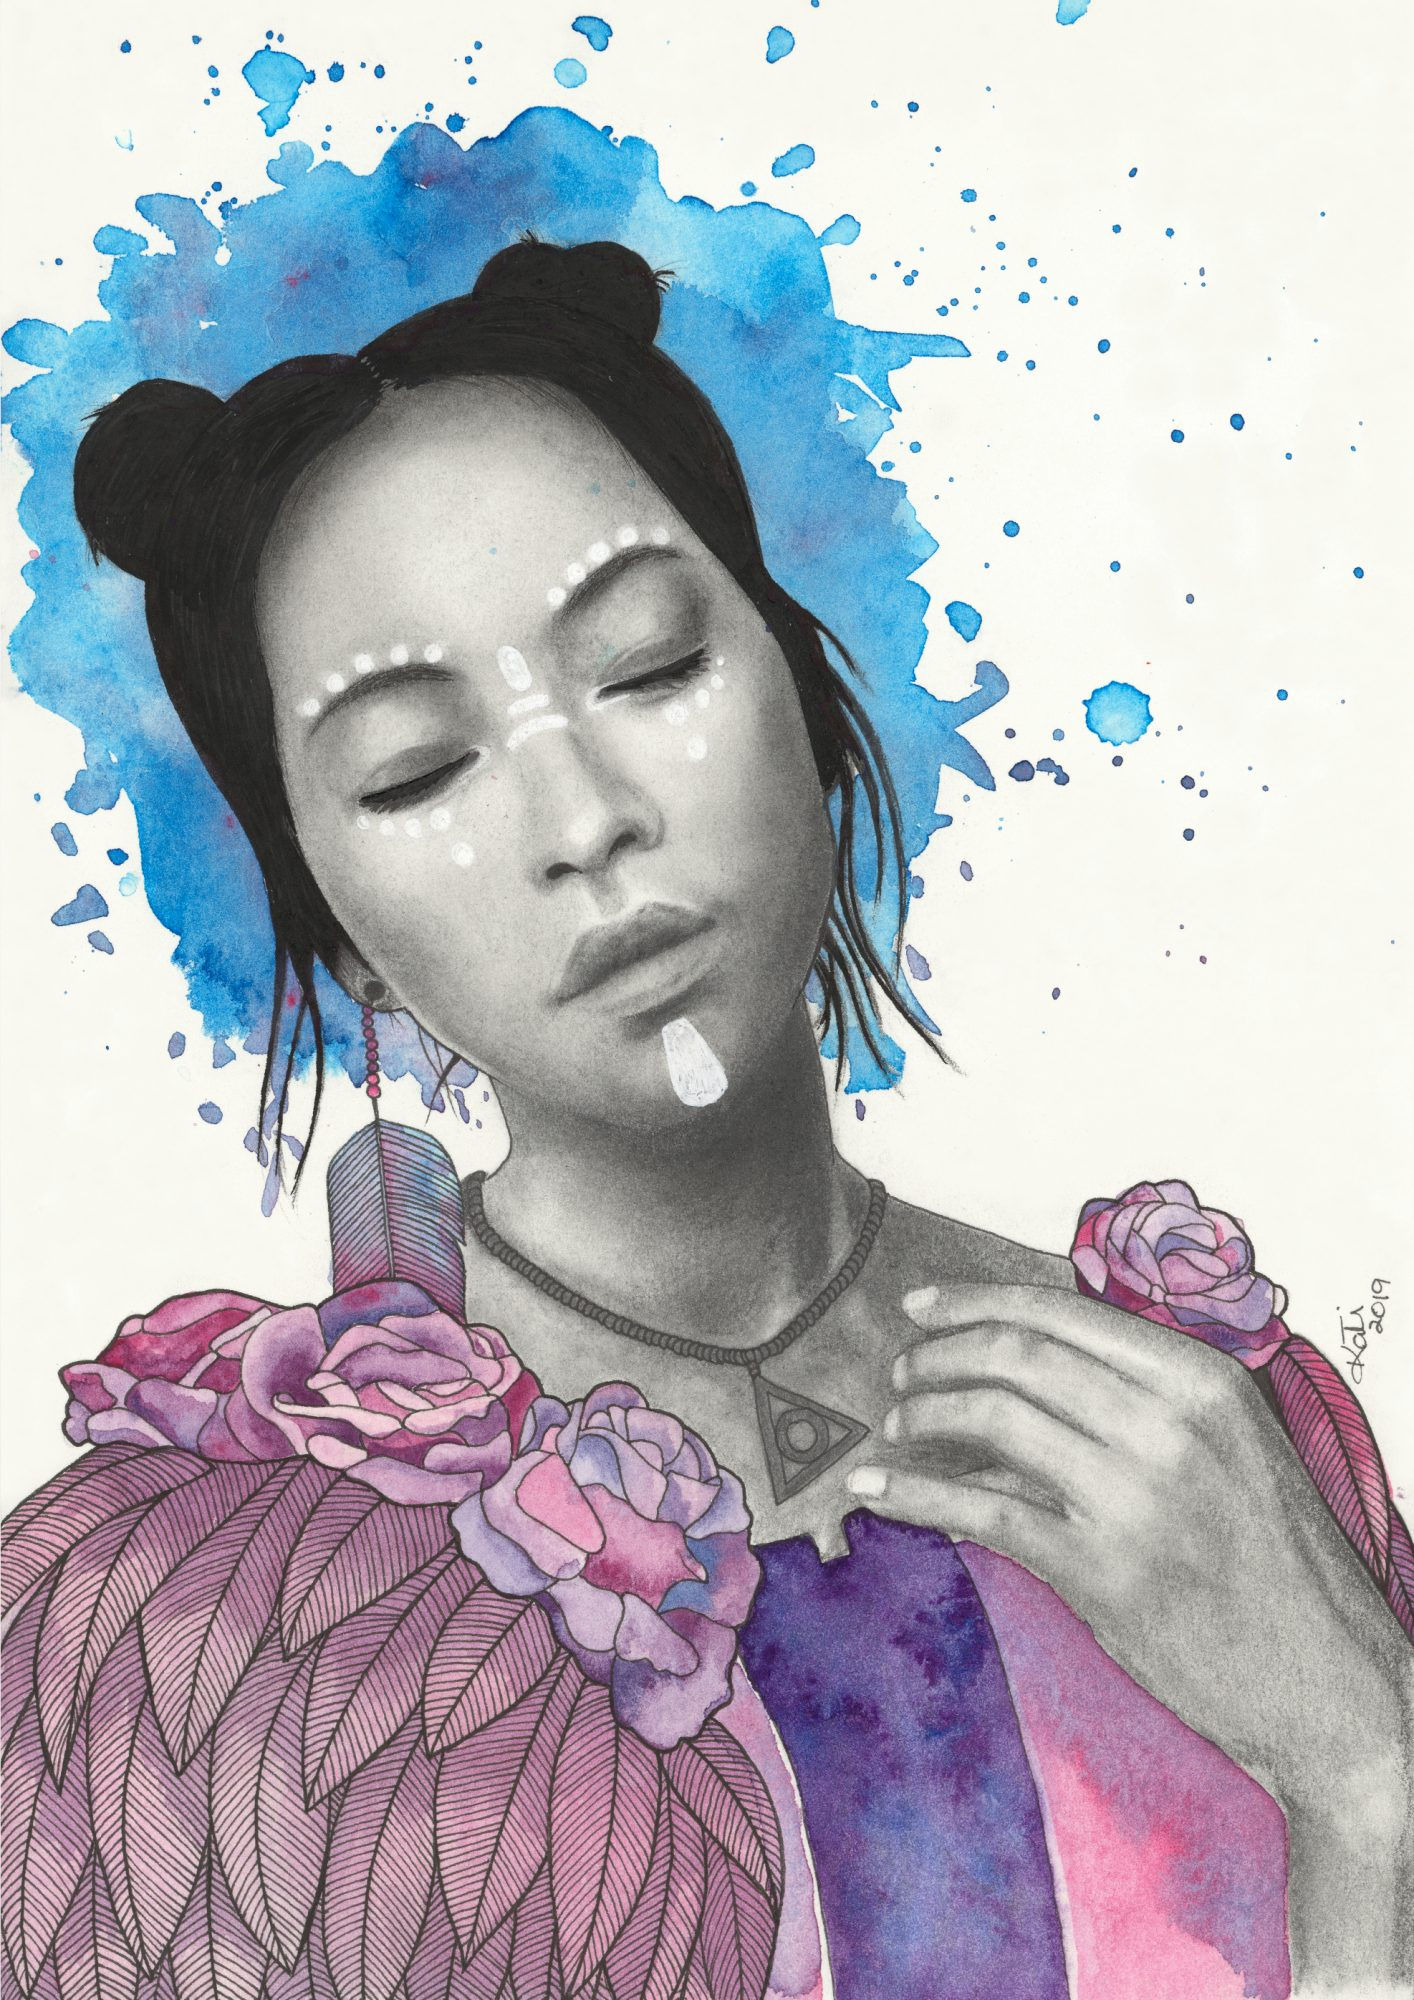 Main2 And She Was By Kati Garrett Filho